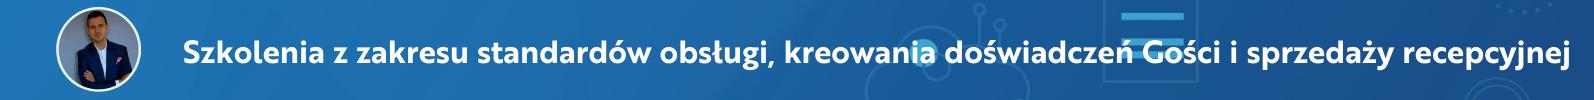 Karol Weber - inspektor hotelowy